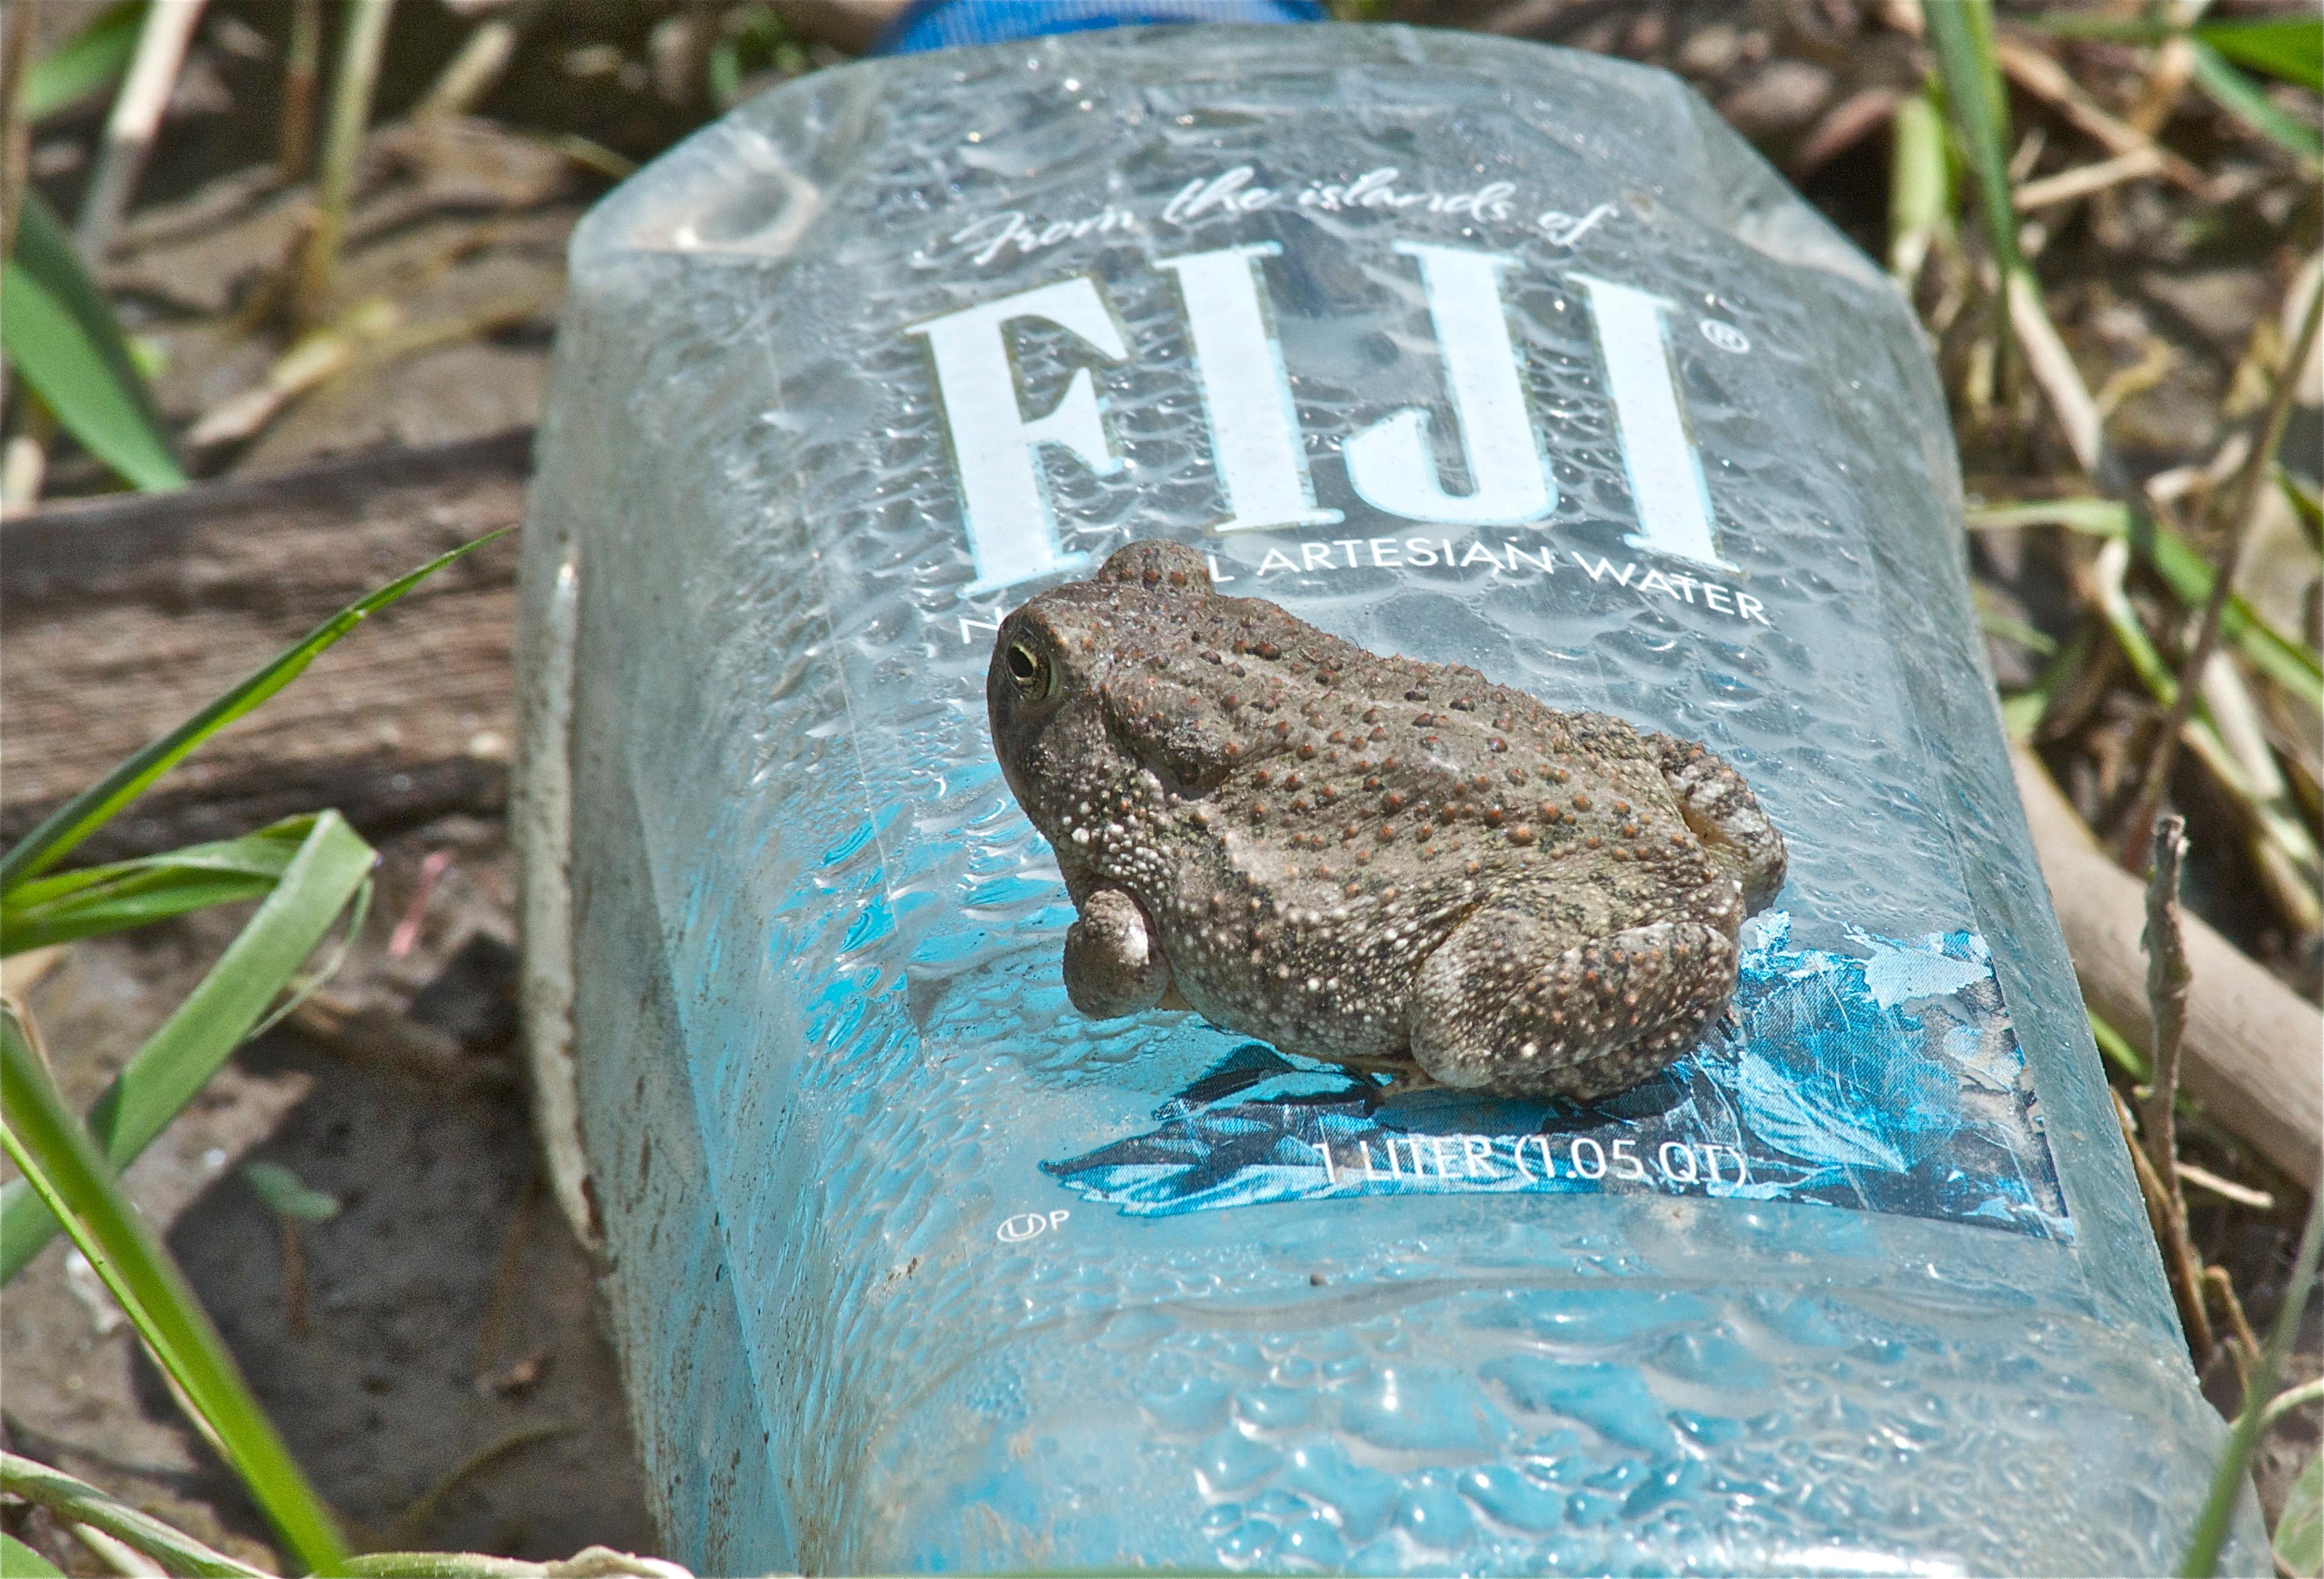 Toad on FiJi Bottle